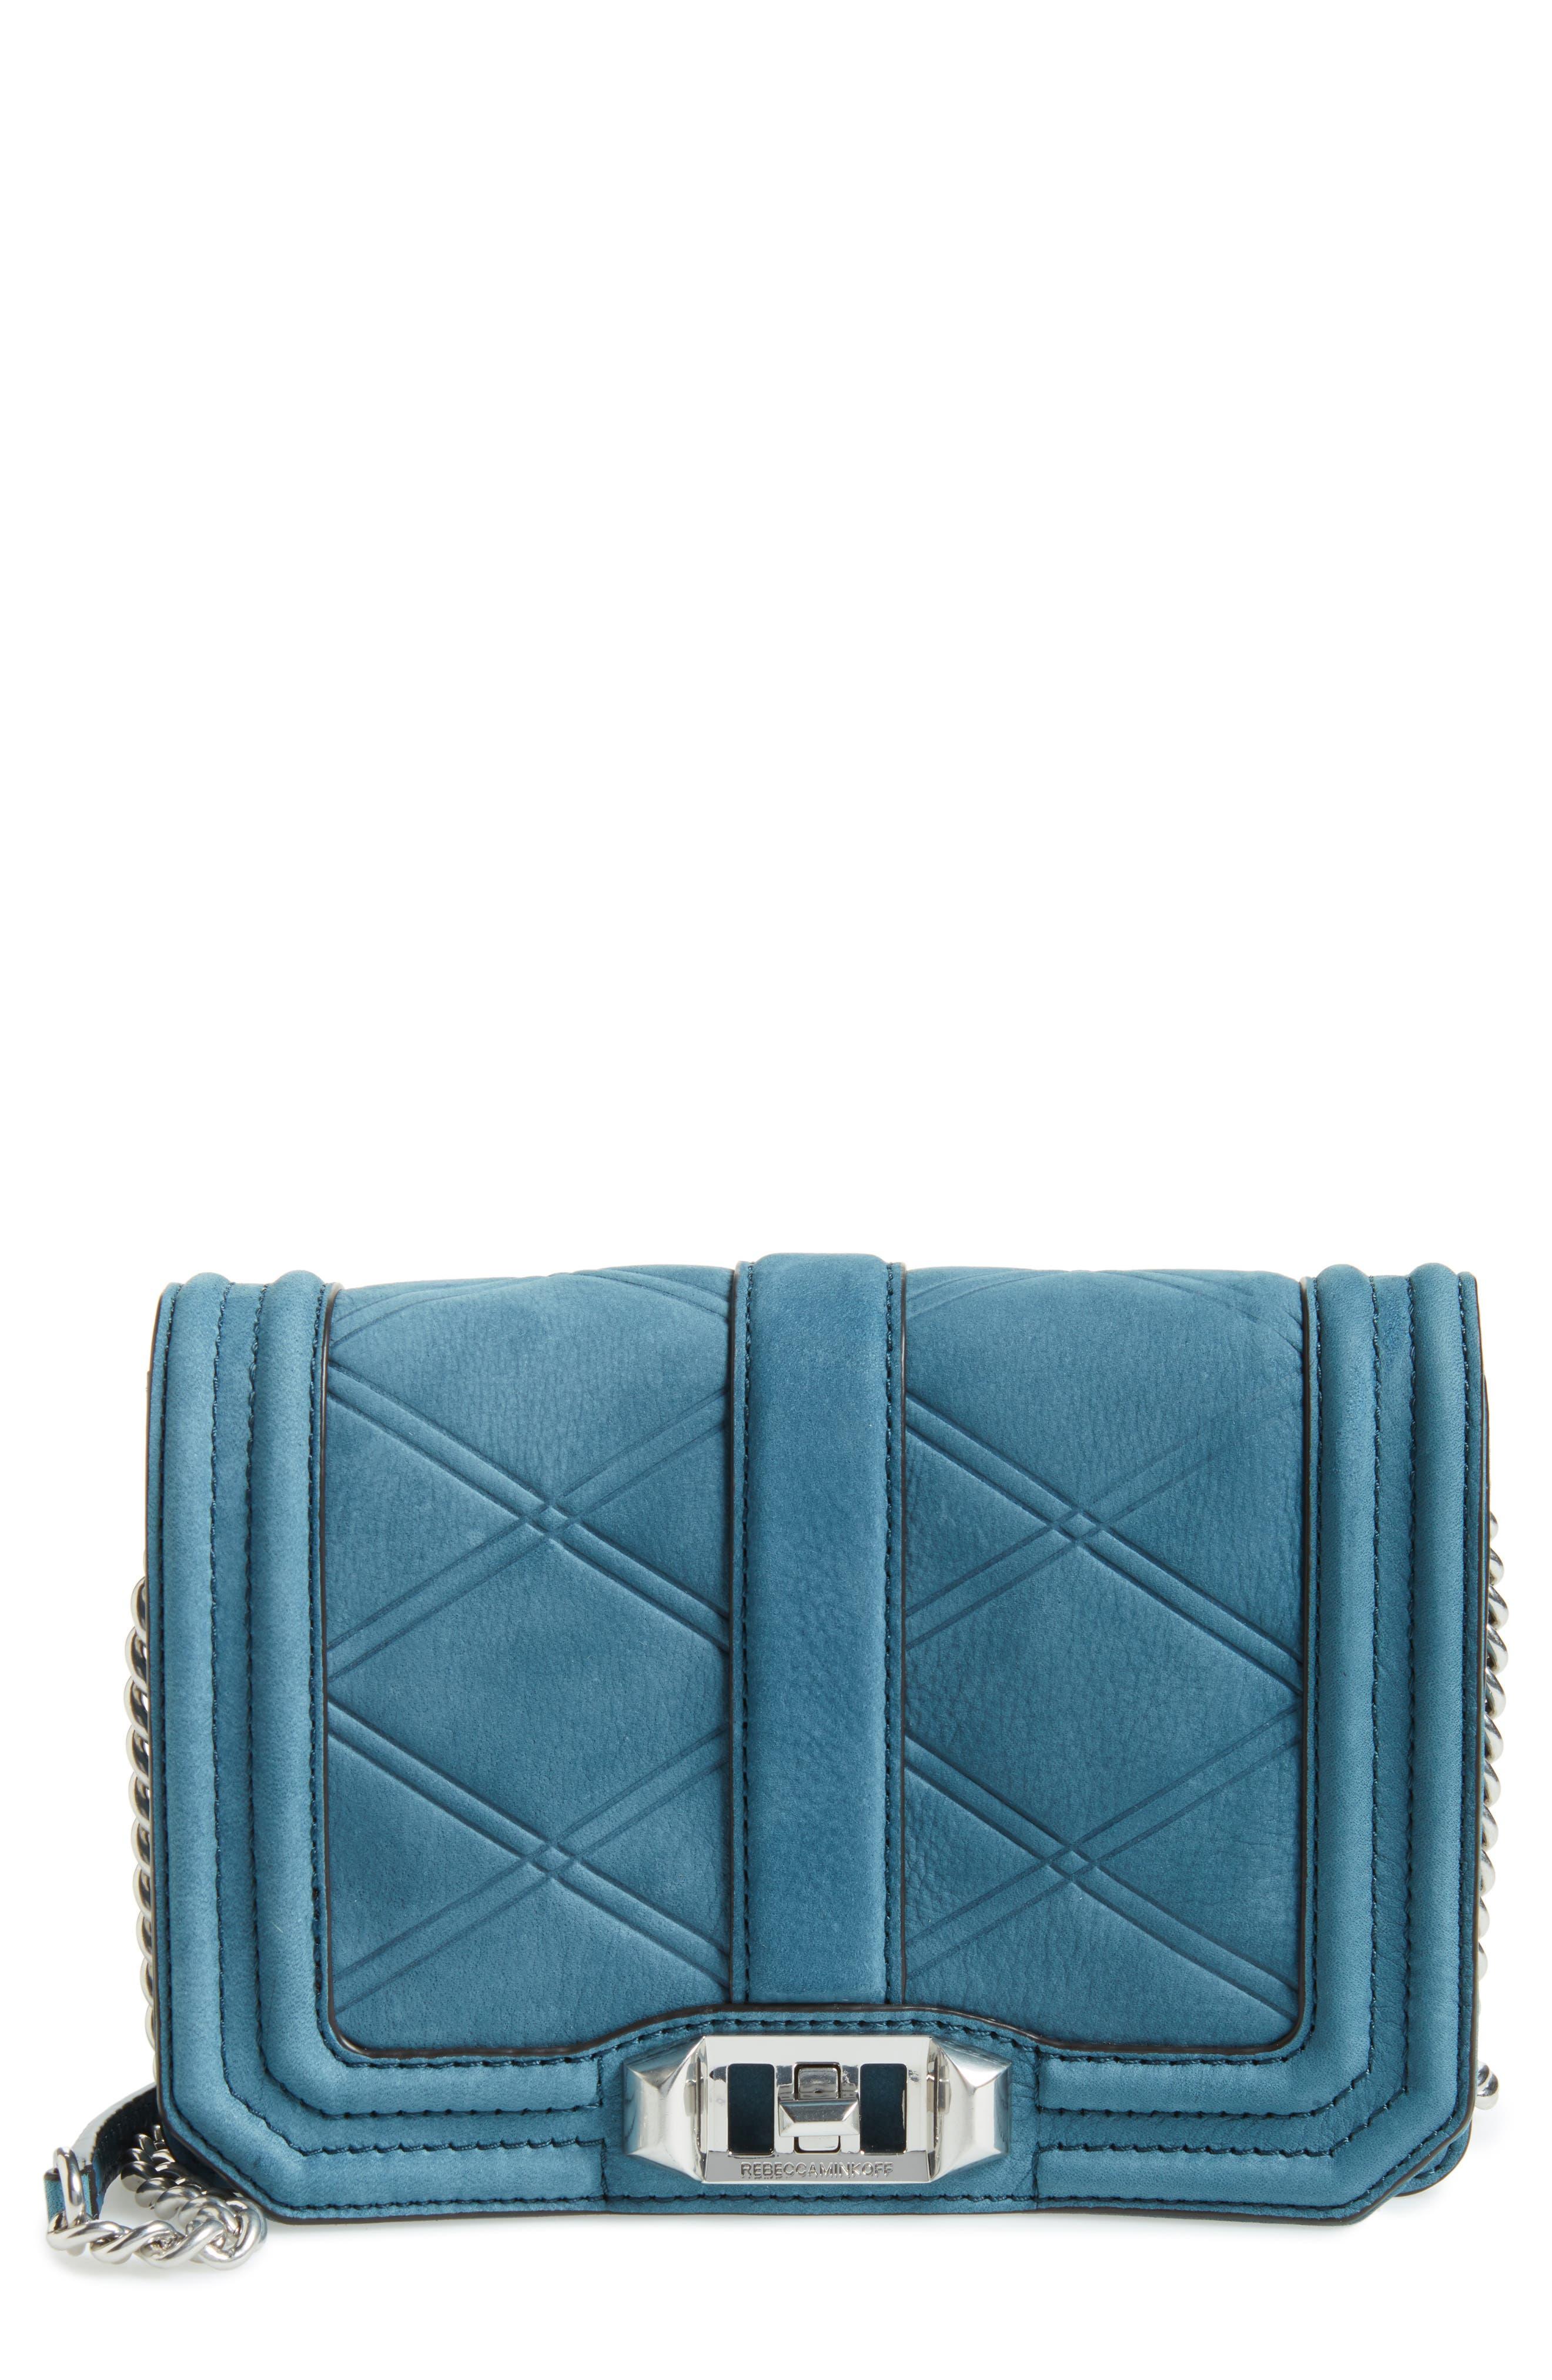 Main Image - Rebecca Minkoff Small Love Nubuck Leather Crossbody Bag